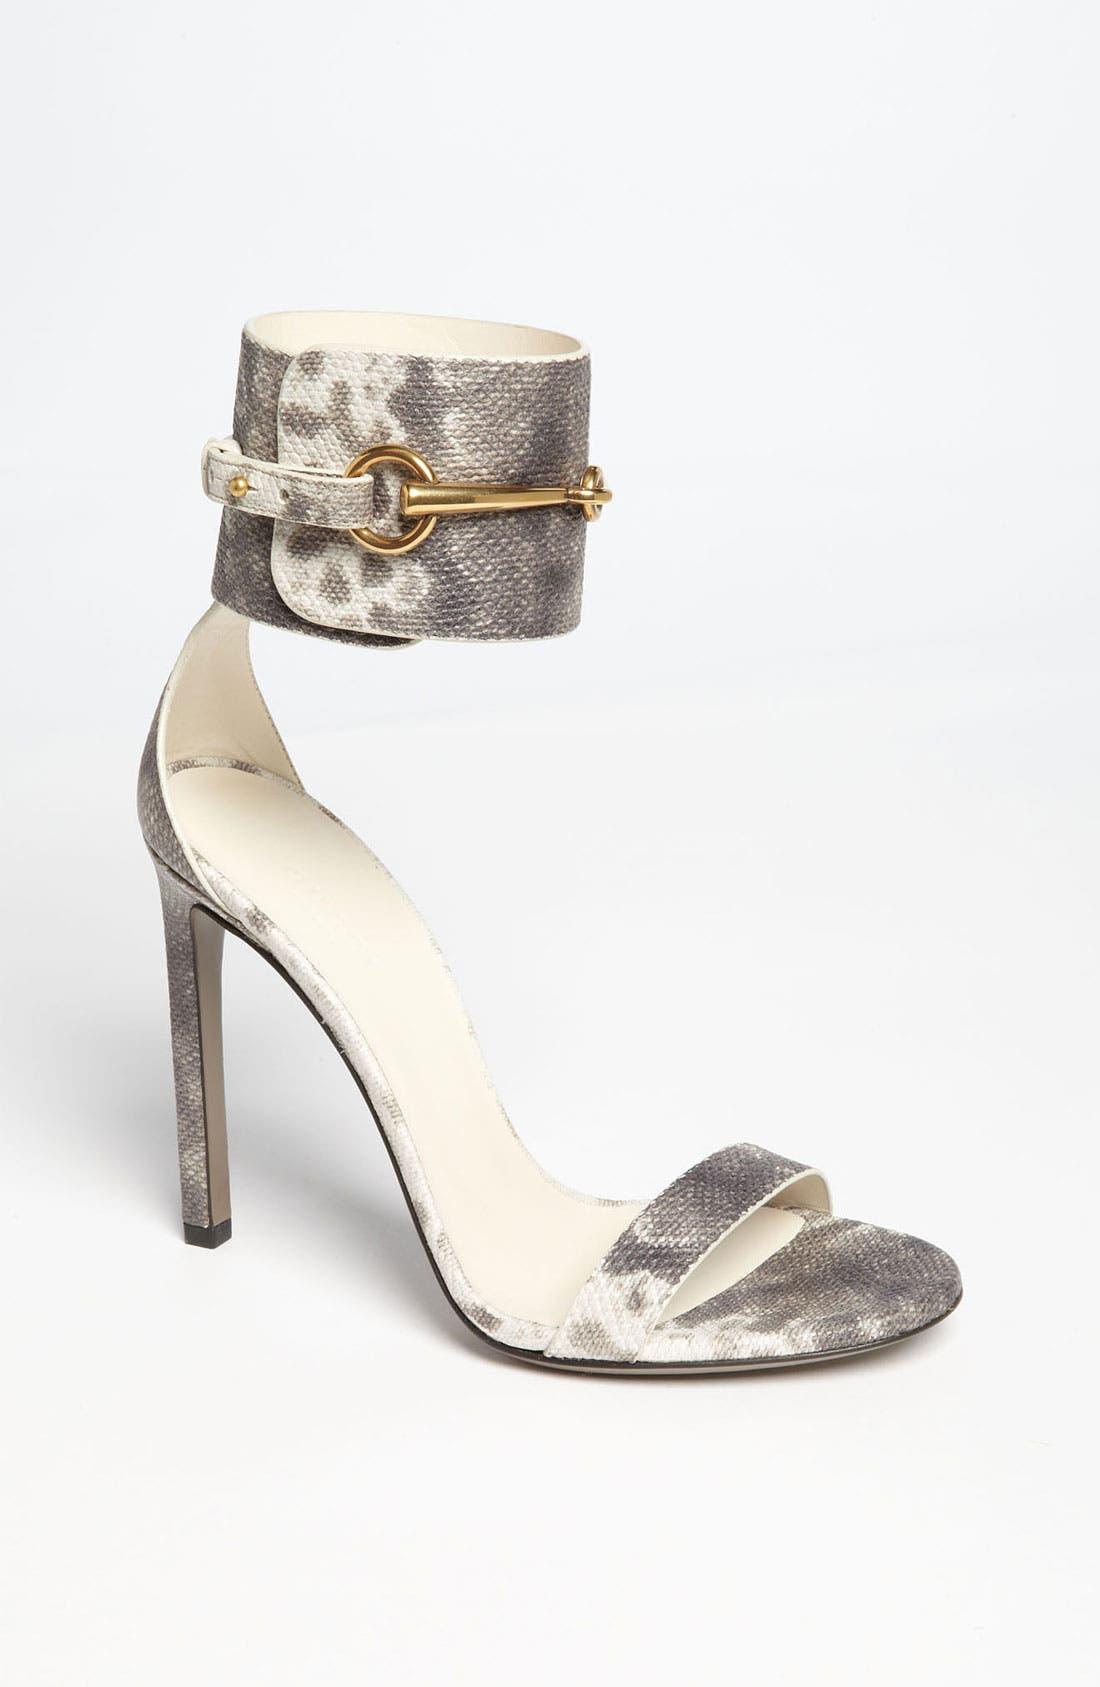 Main Image - Gucci 'Ursula' Sandal